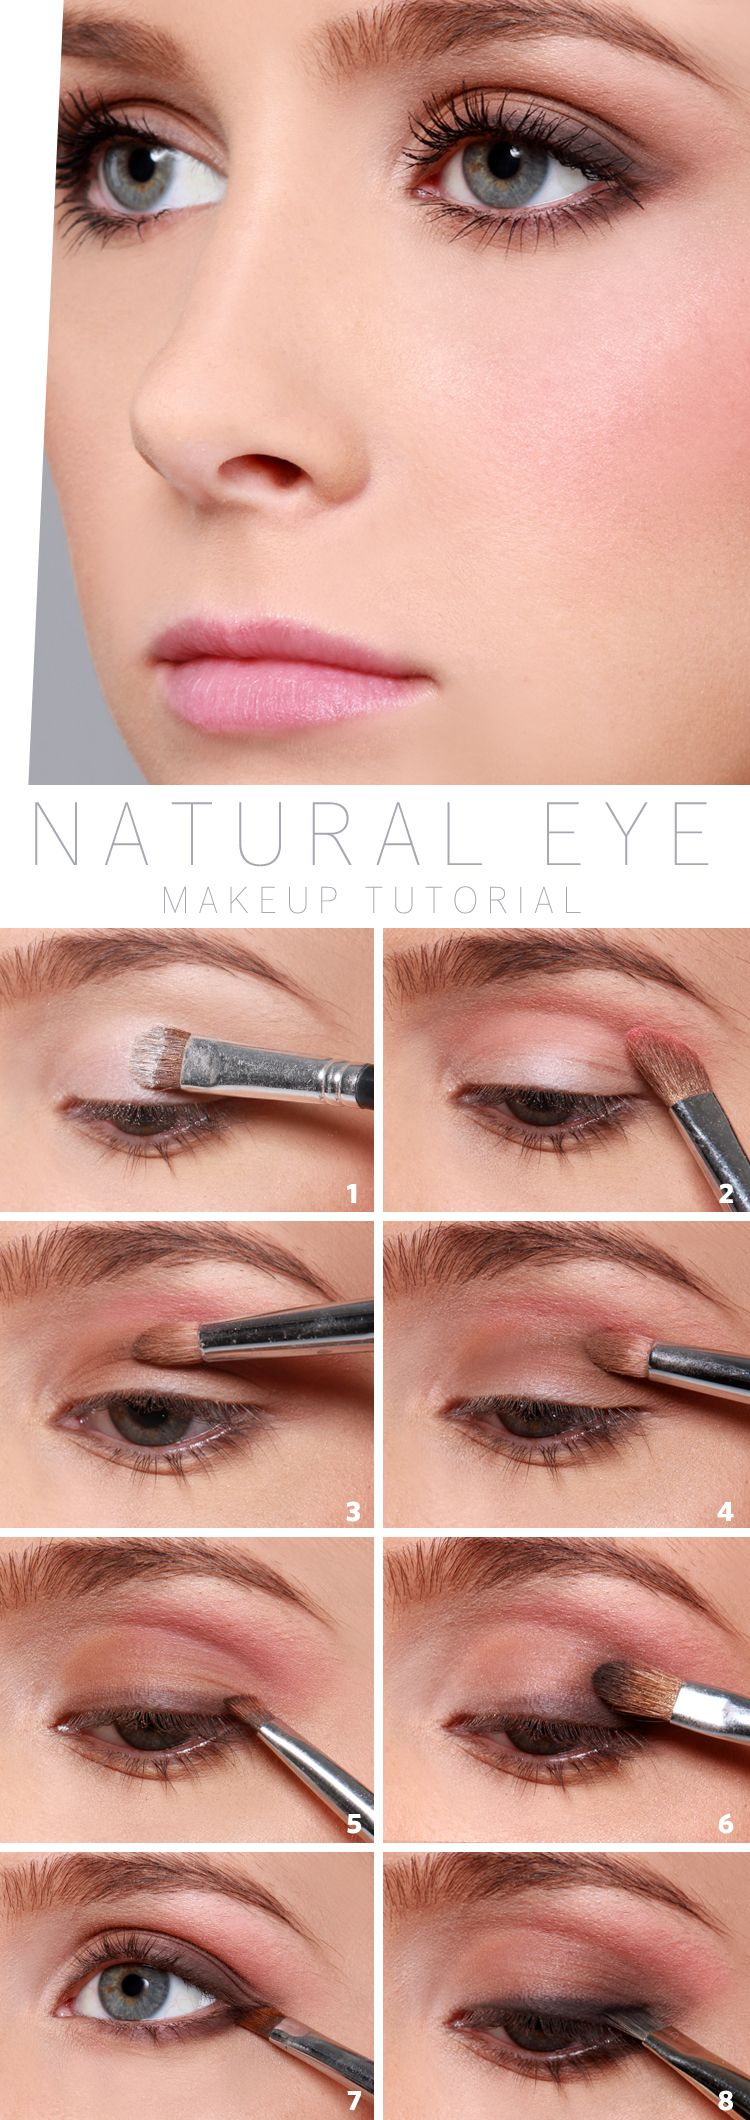 Lulus Howto: Natural Eye Makeup Tutorial